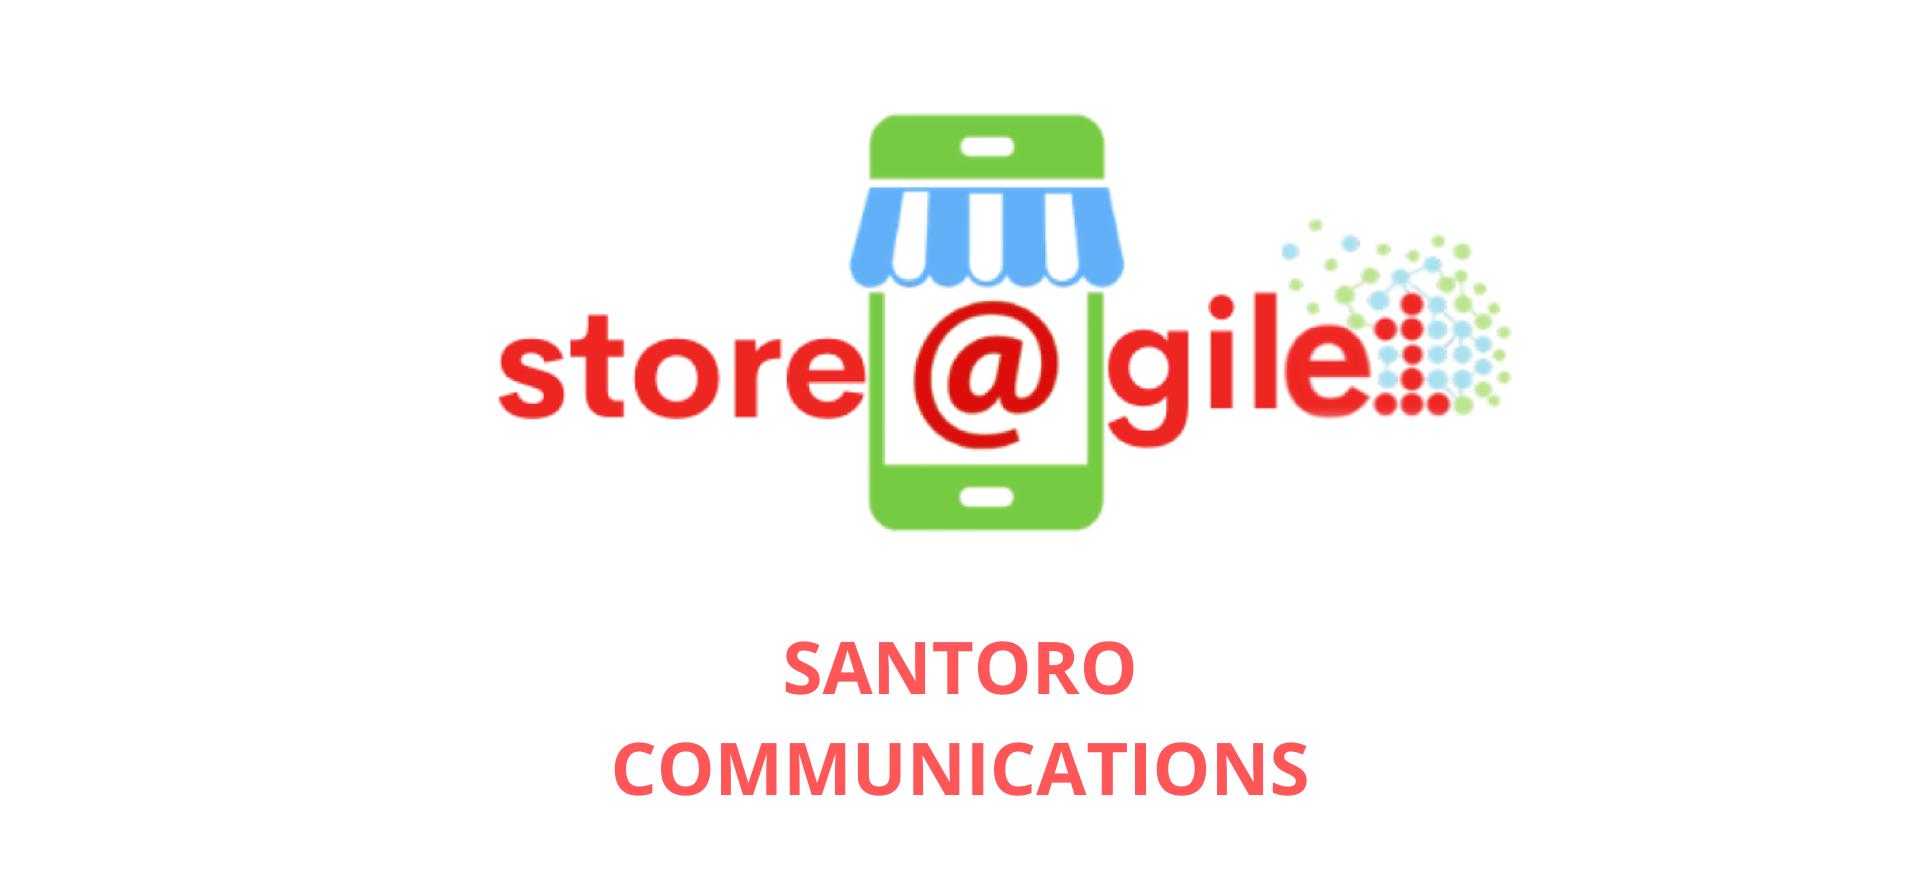 Santoro Communications